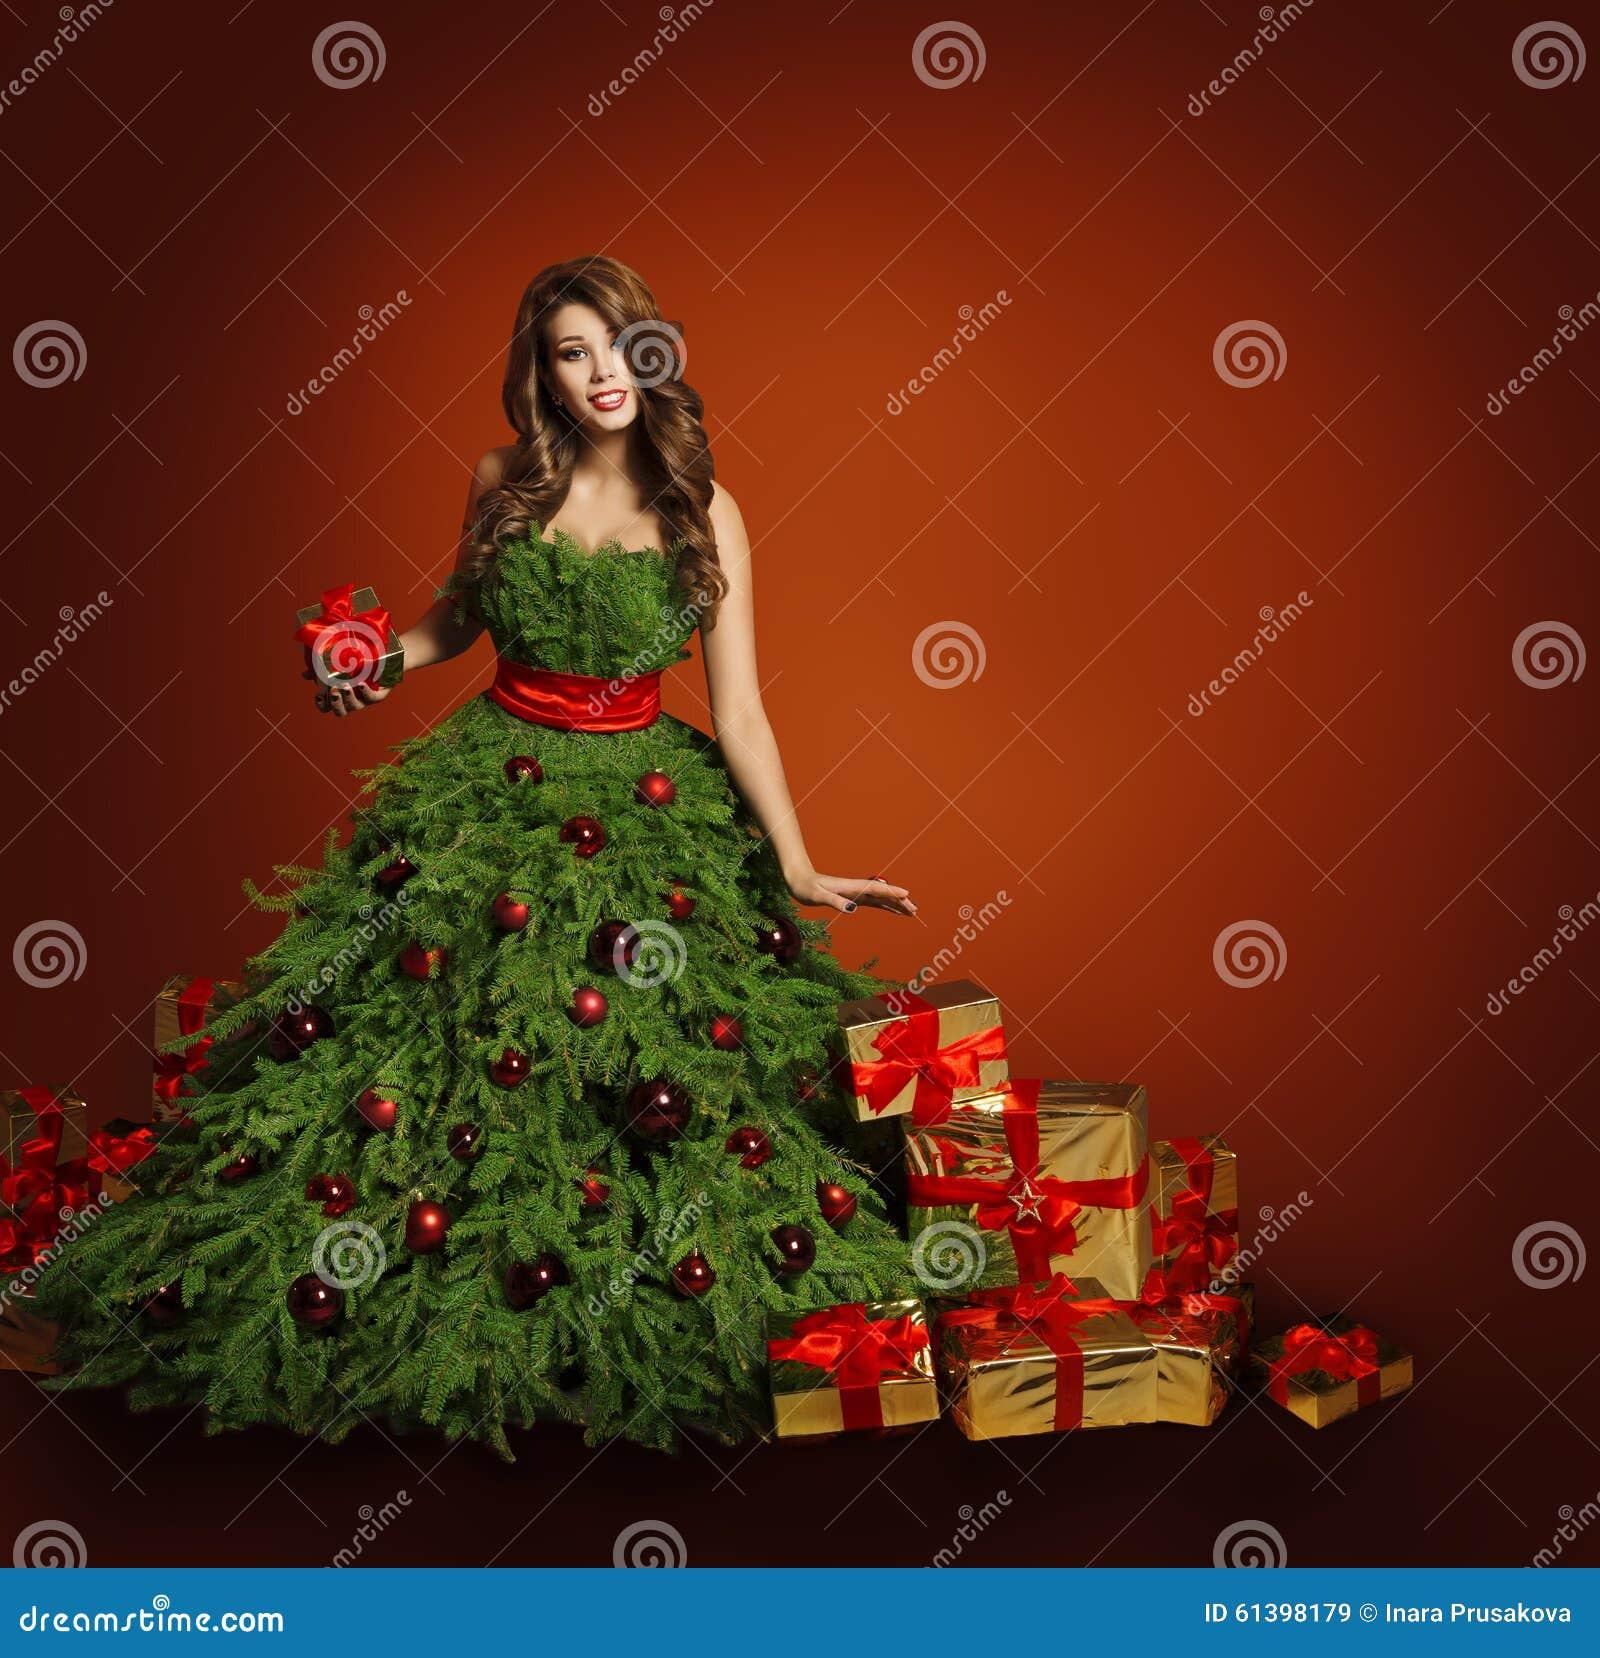 Christmas Tree Fashion Woman Dress Model Girl Red